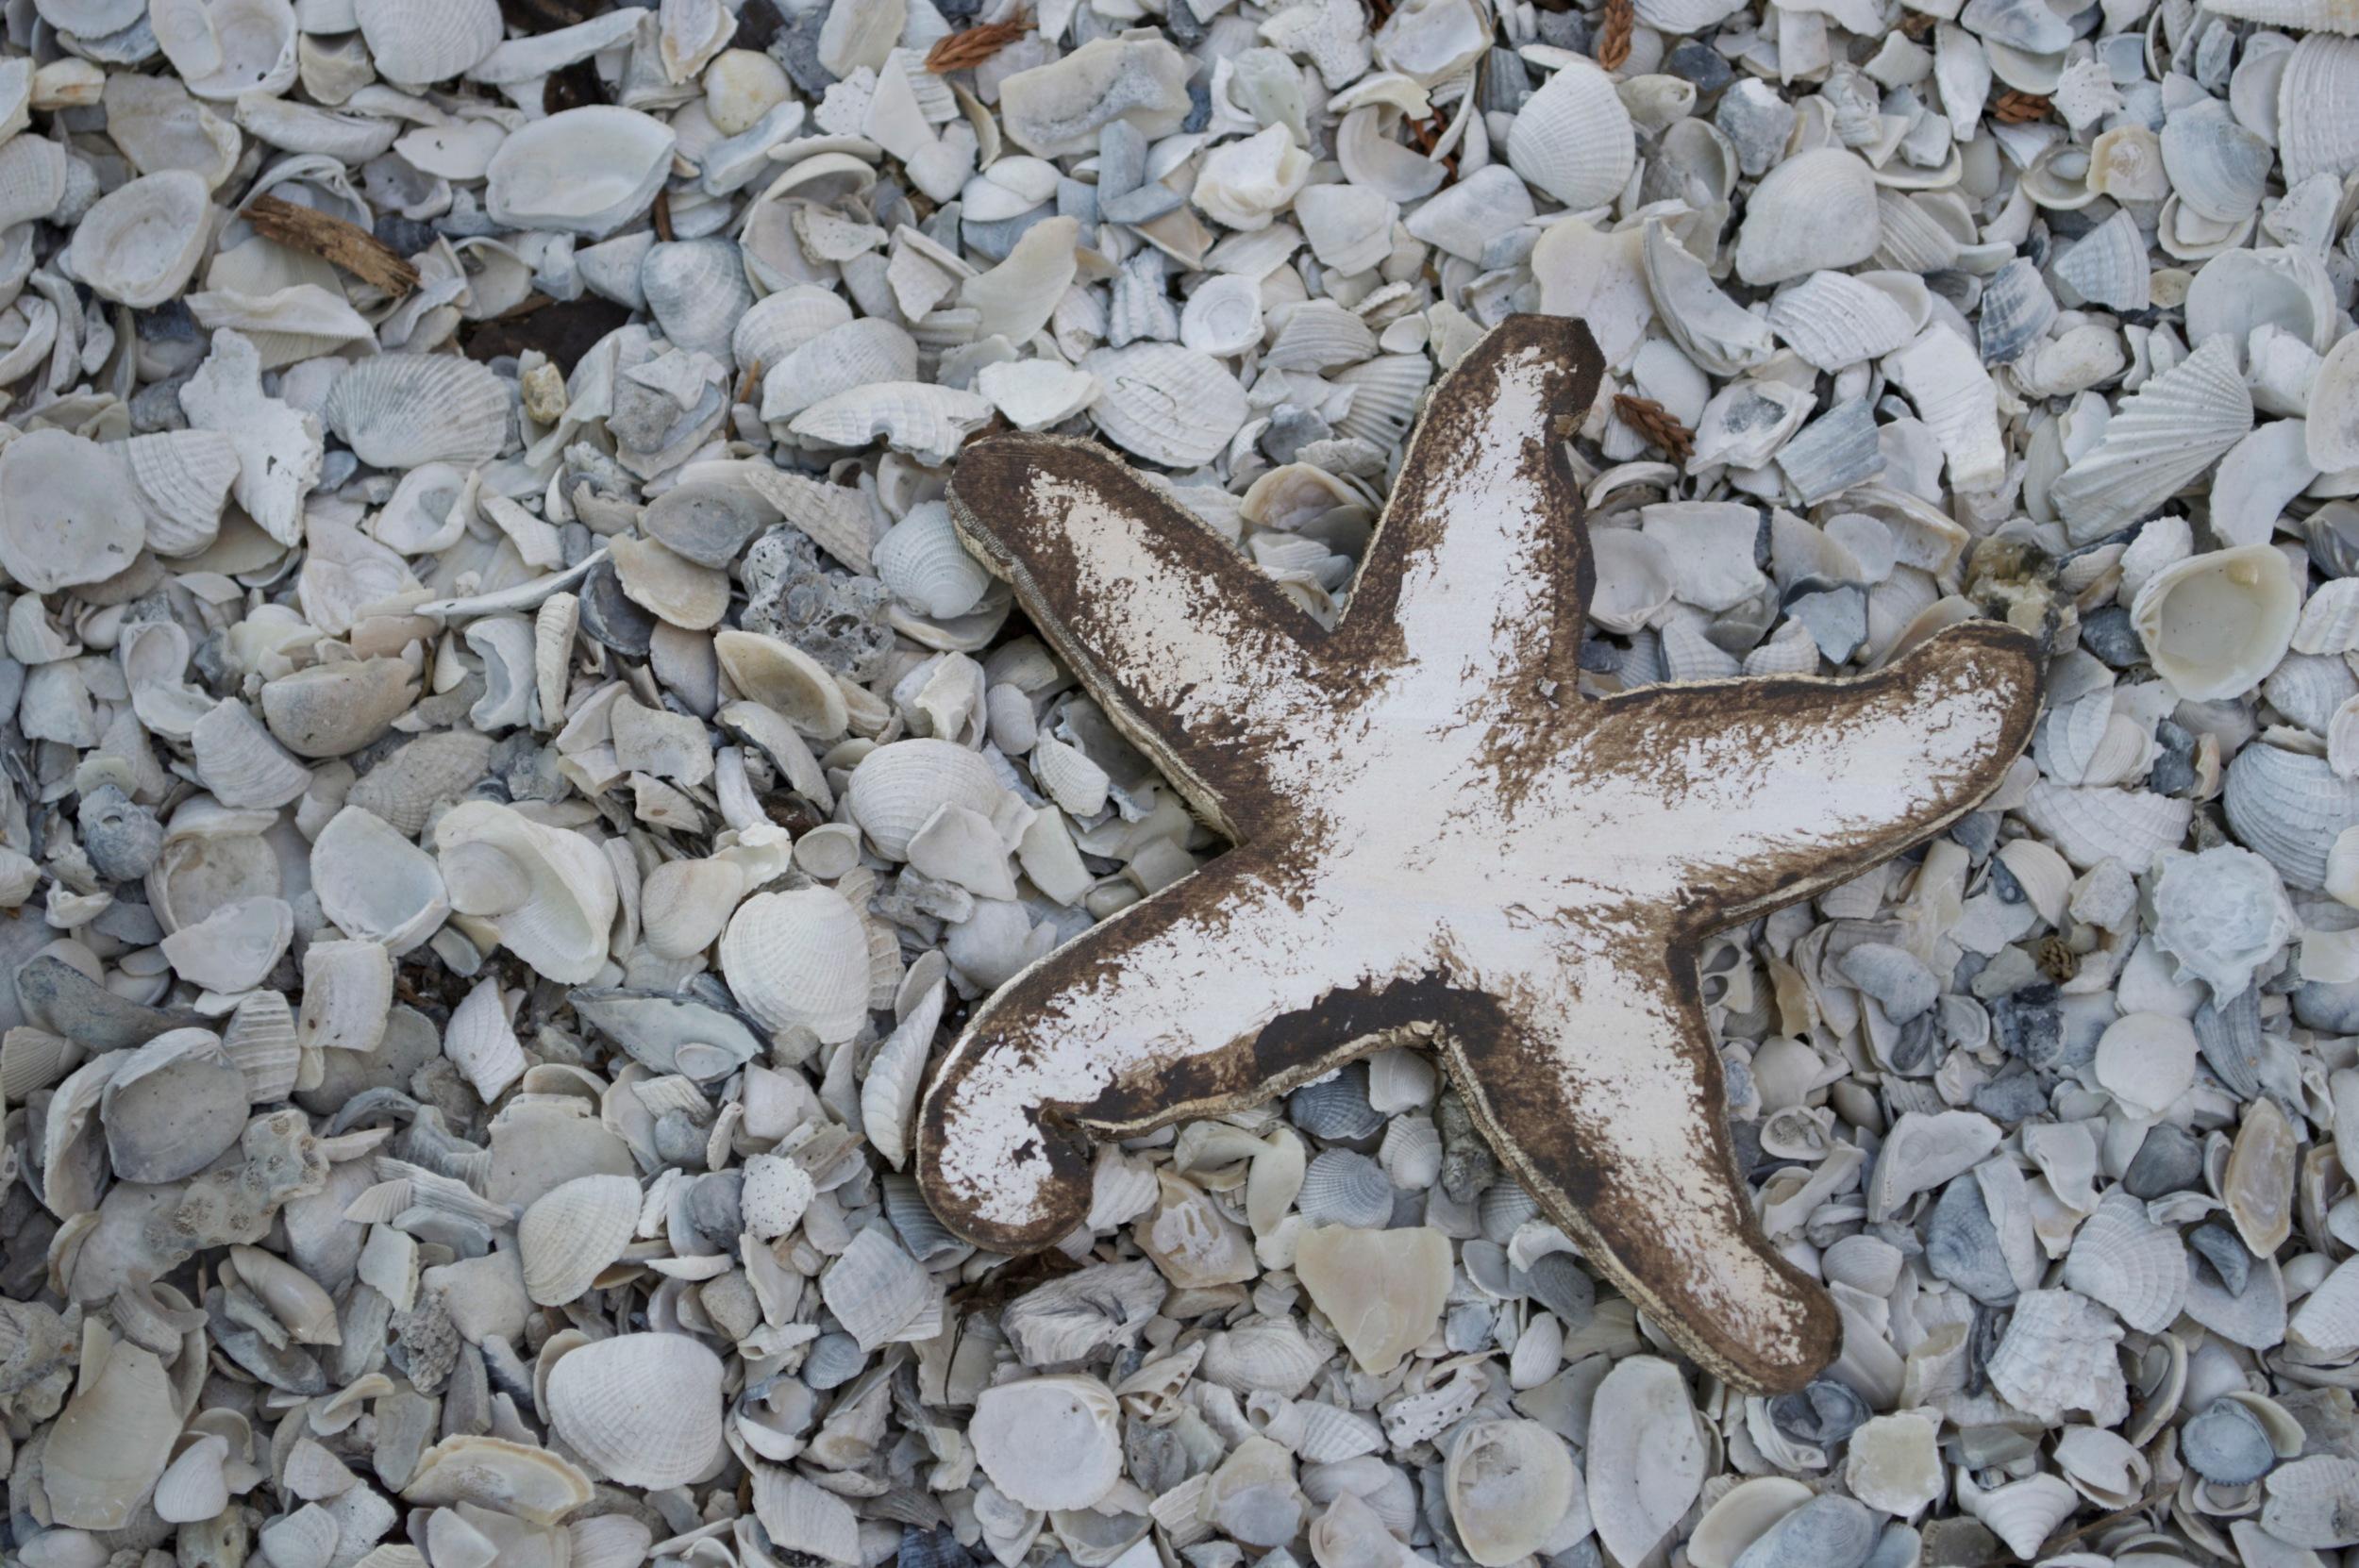 "Beach Art - Sm. Star Fish (plain) - wood, shells - 3/4"" thick, 5"" wide - $10"